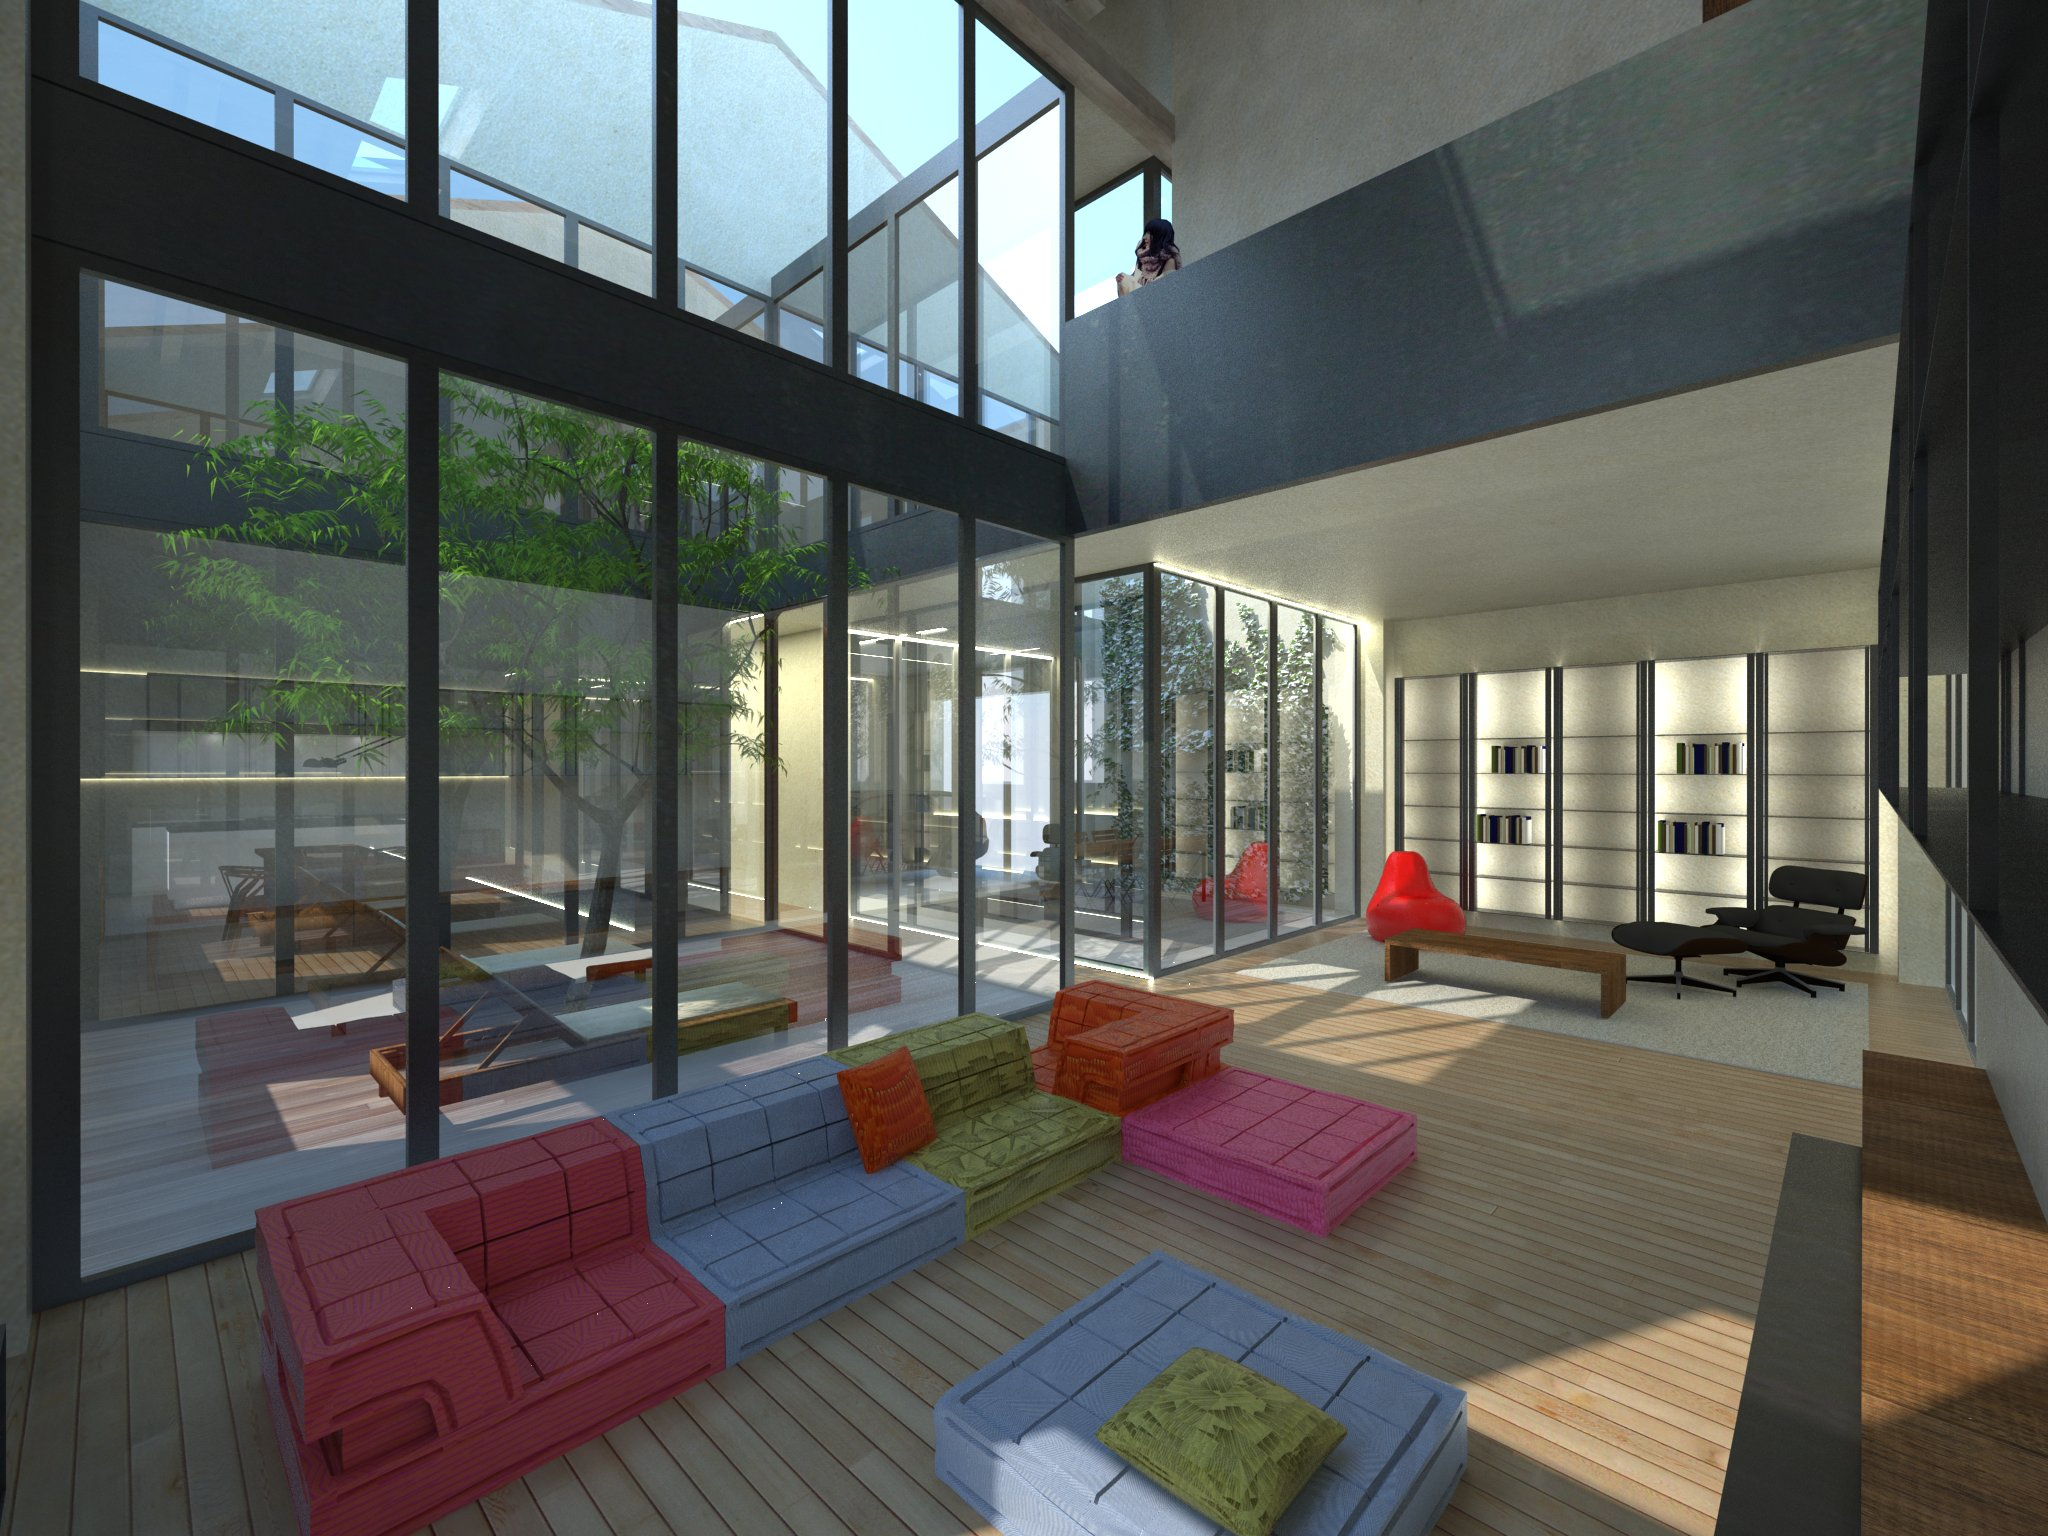 loft matteo selleri interior design imola